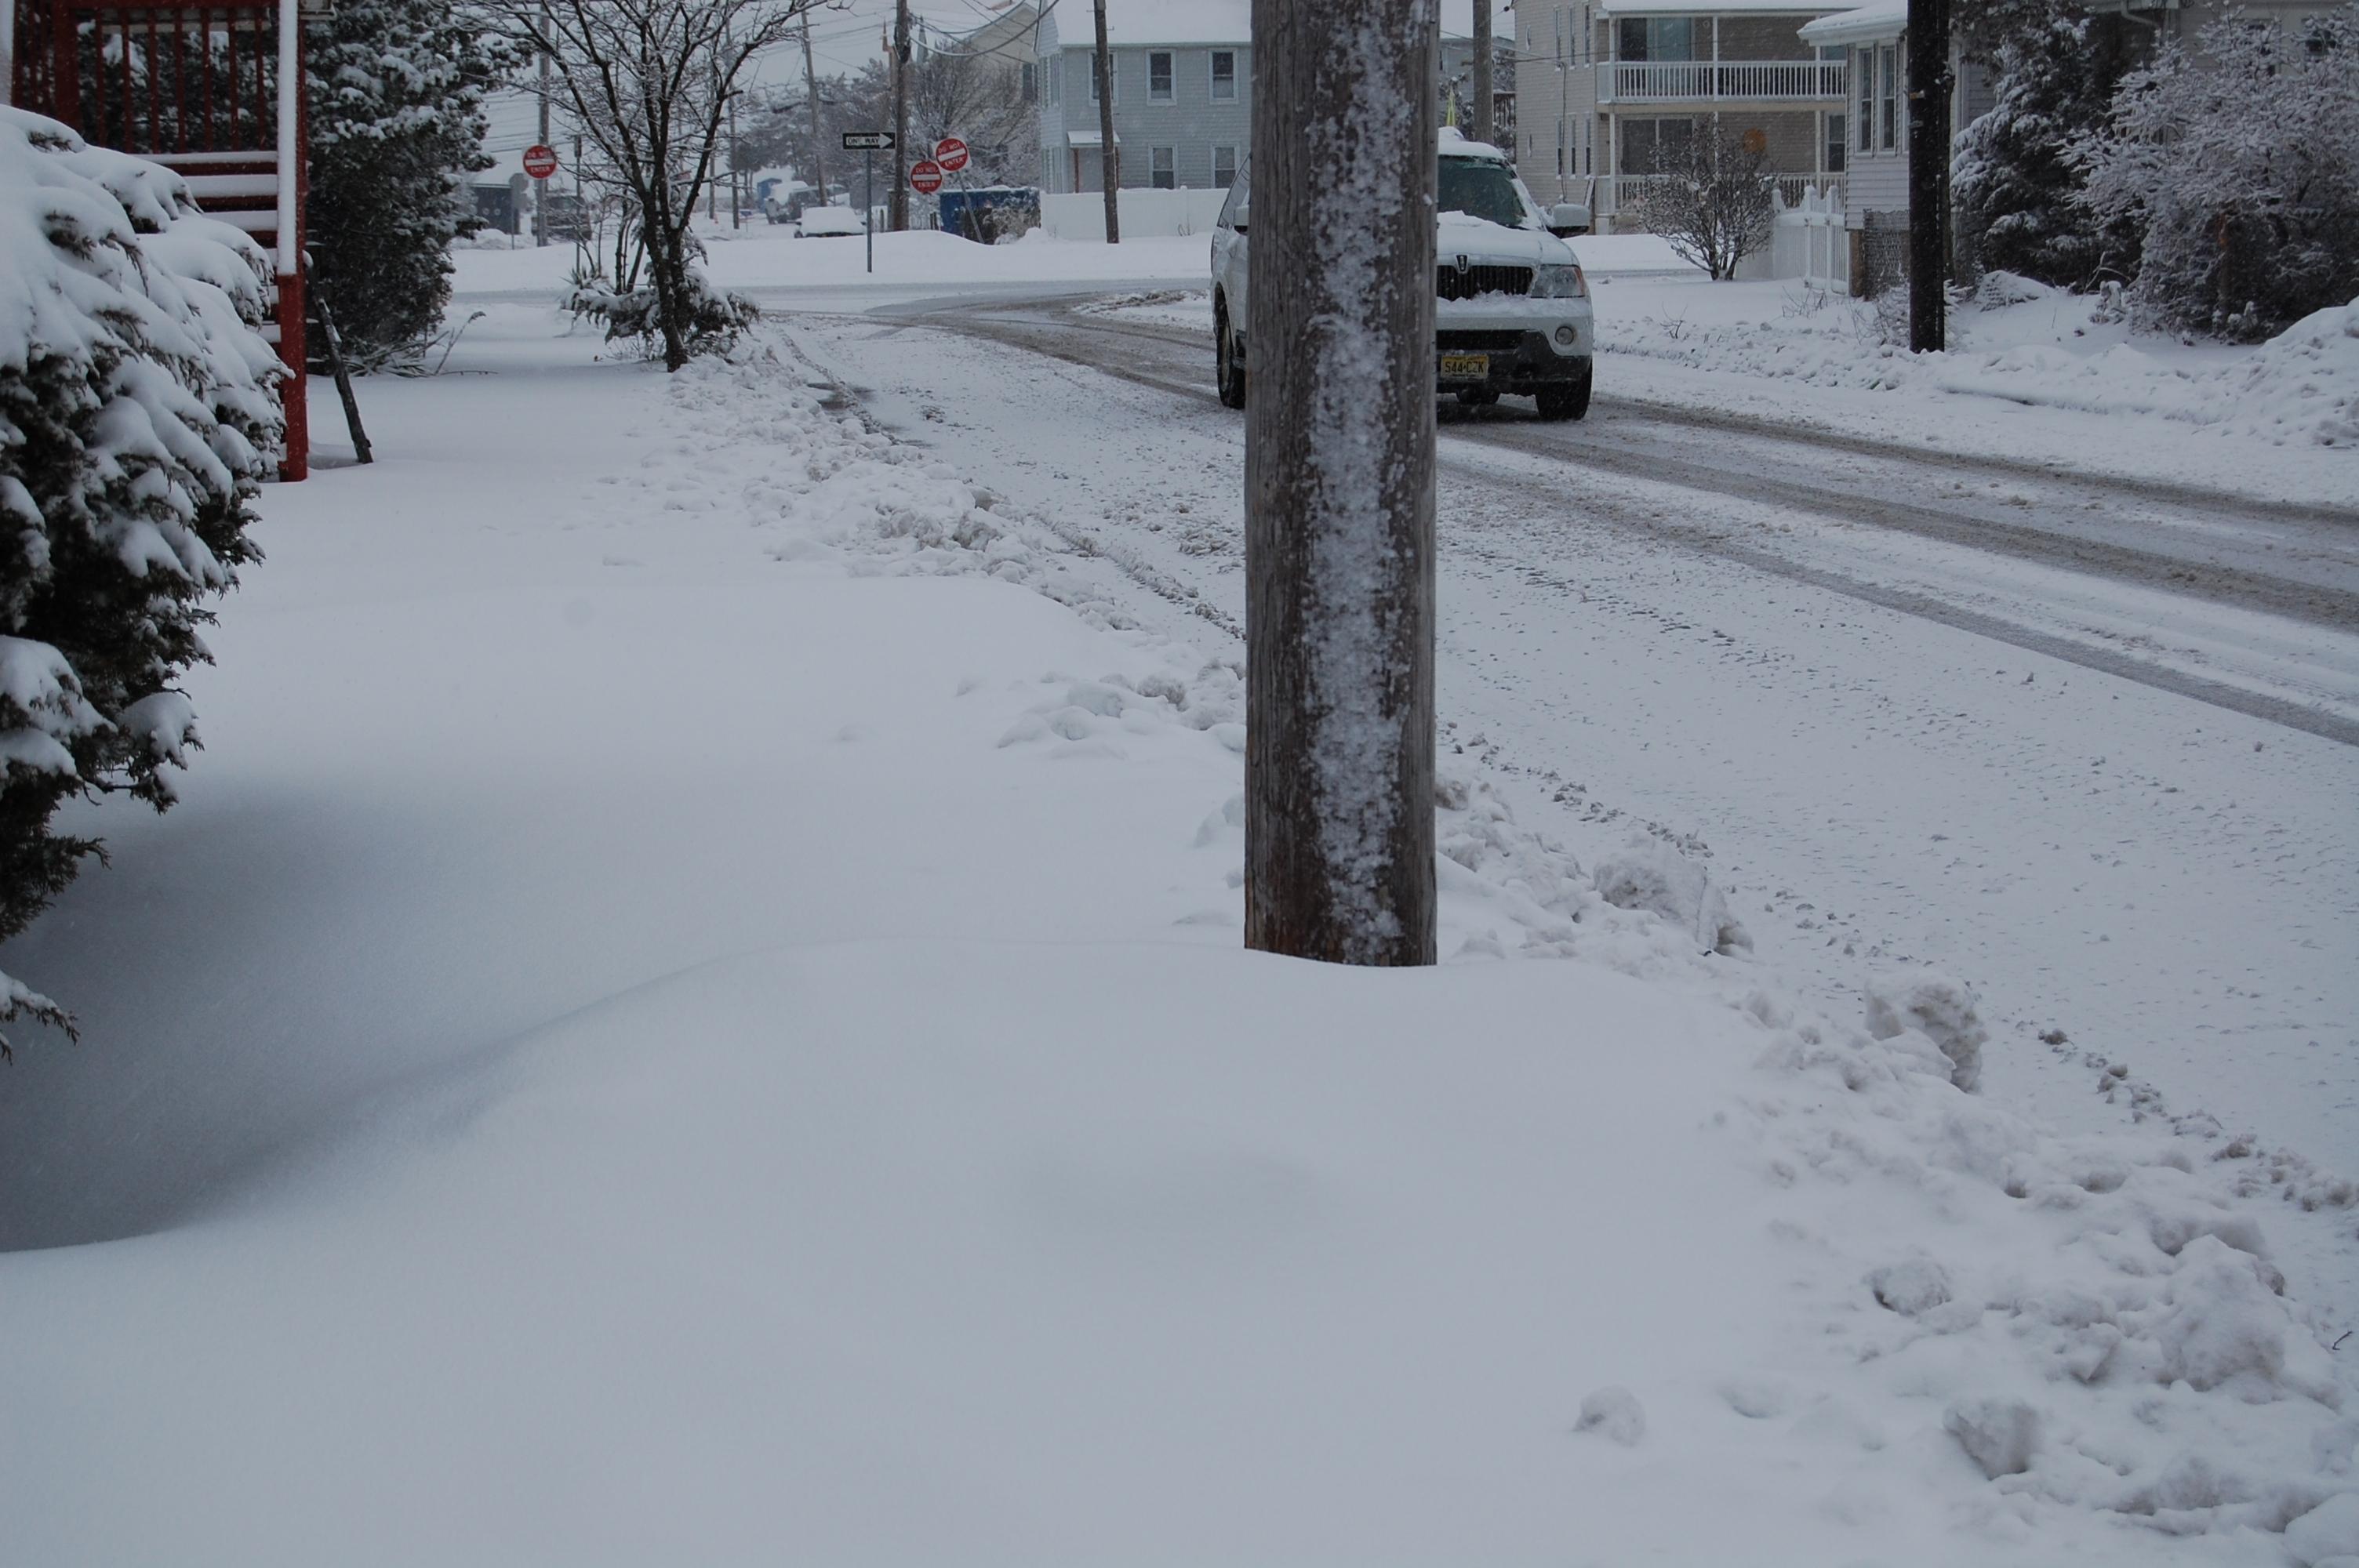 Snow, March 5, 2015. (Photo: Daniel Nee)